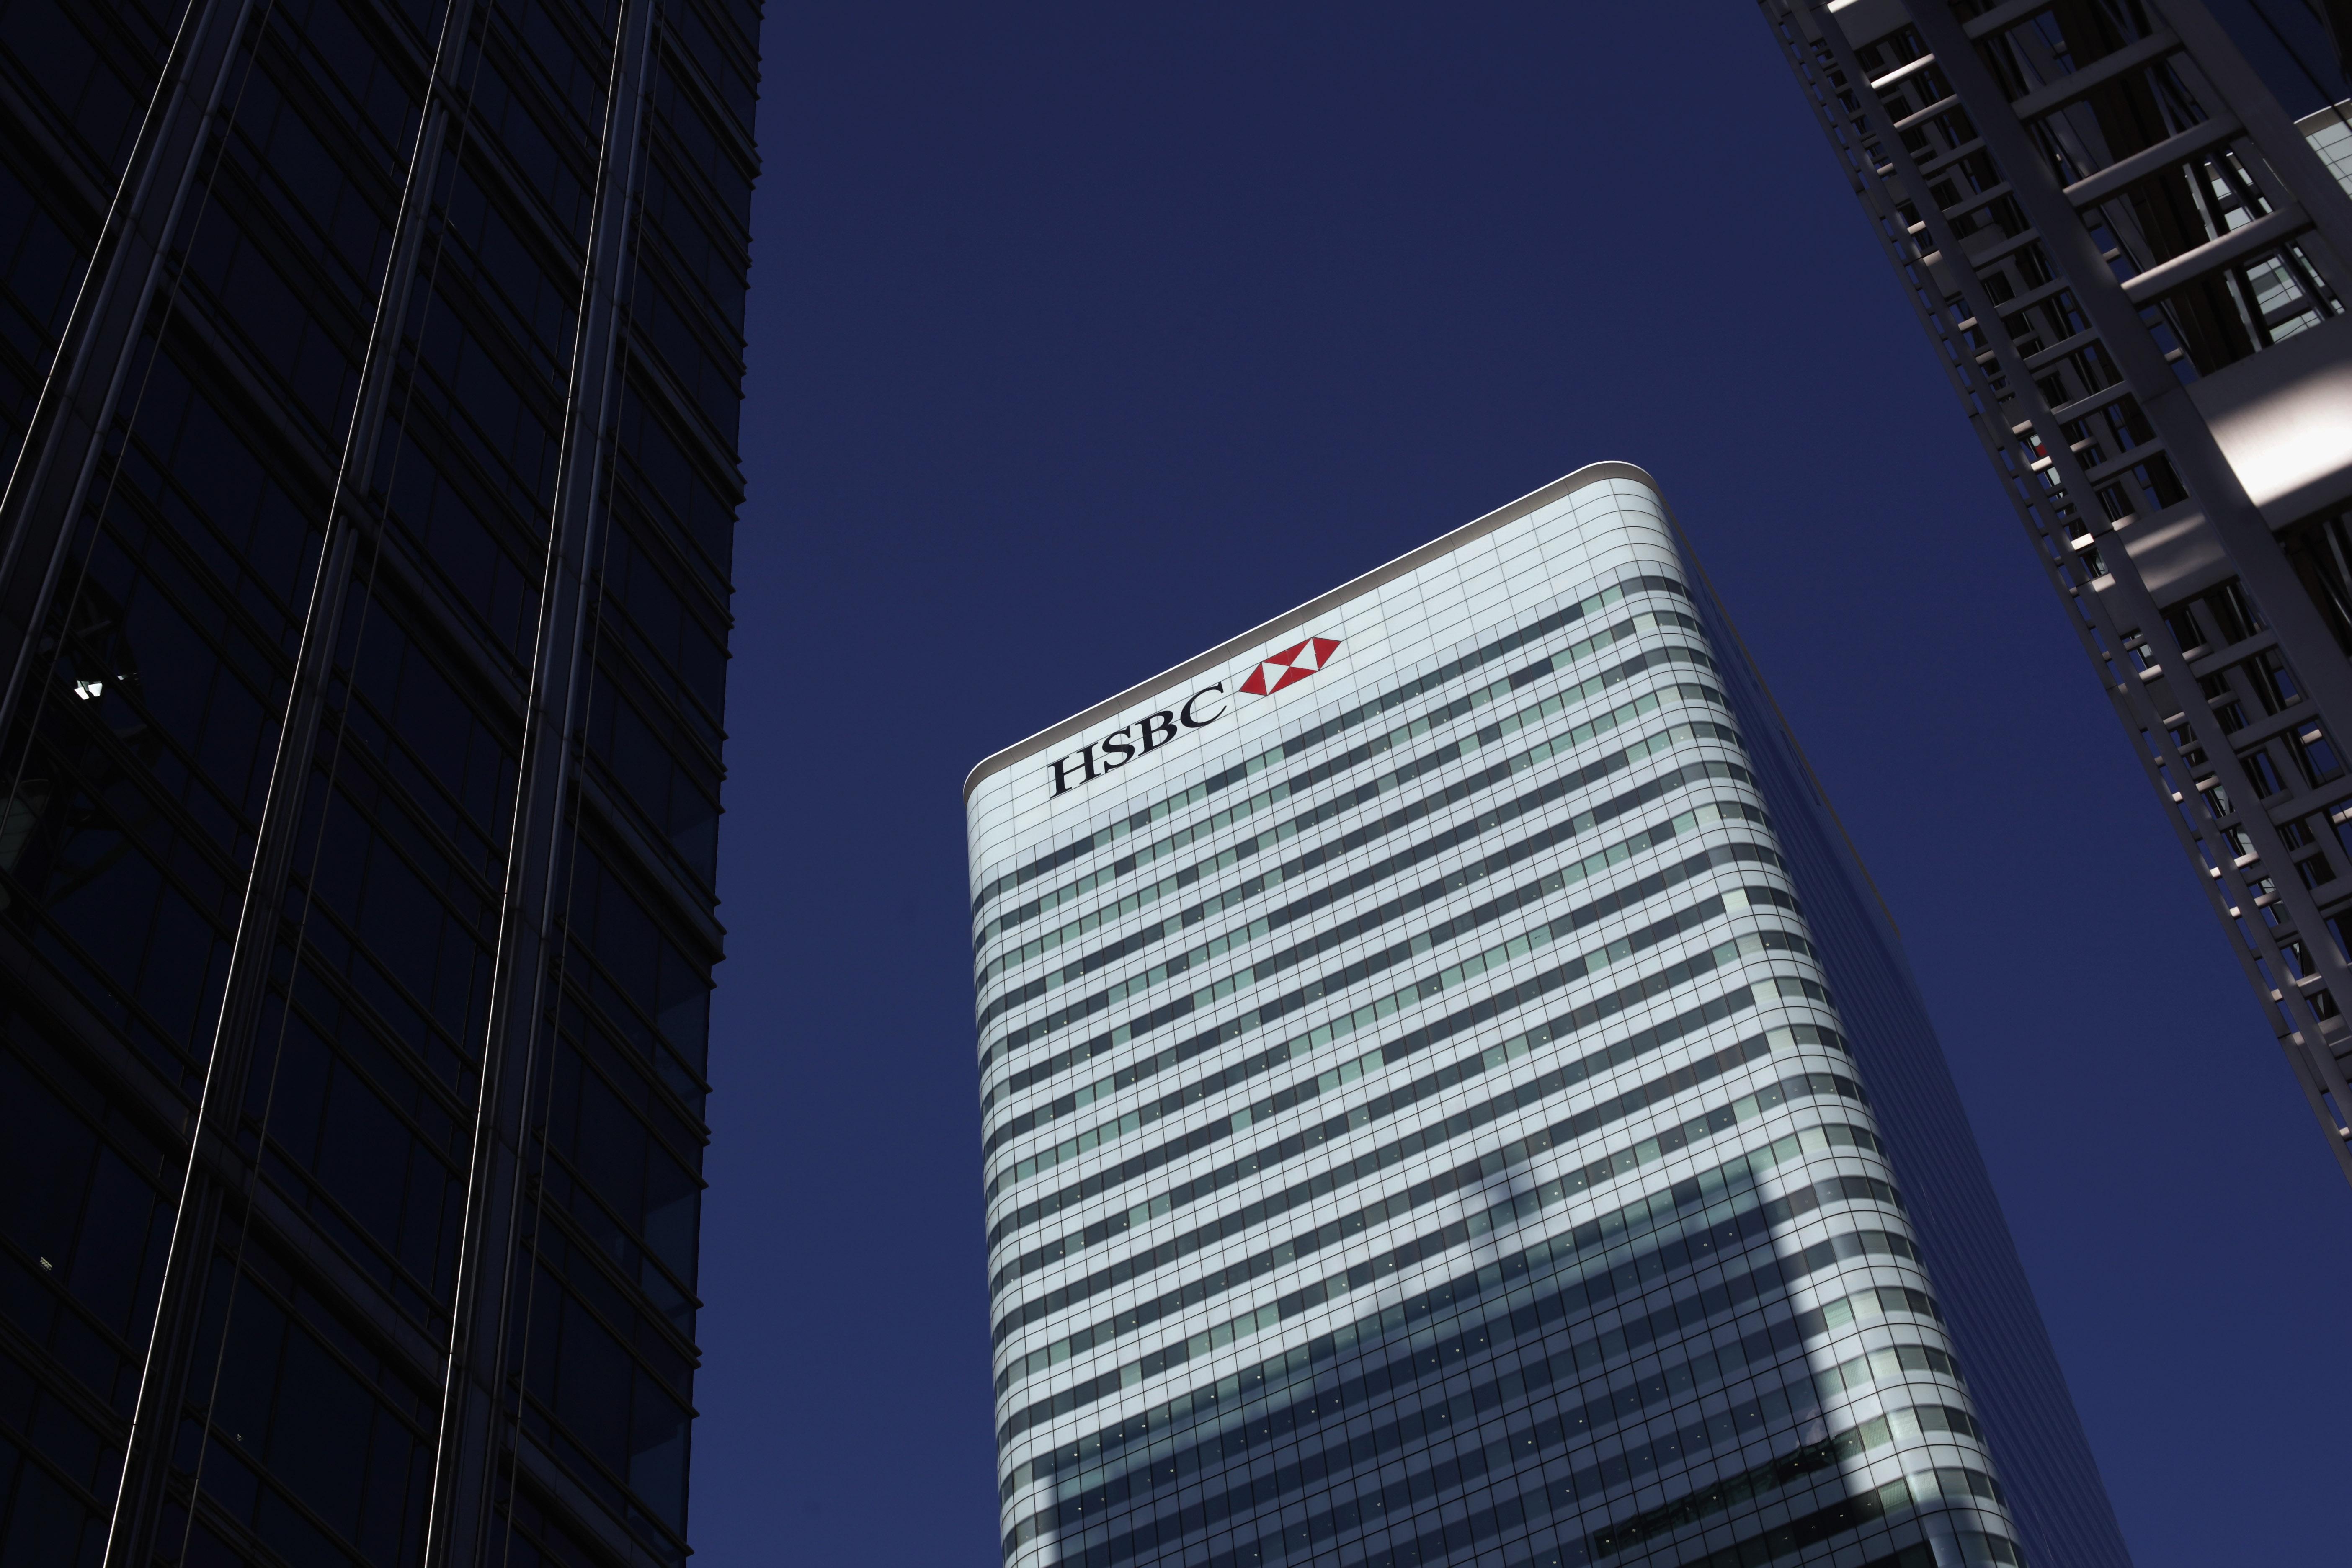 HSBC Holdings Archives - CityAM : CityAM